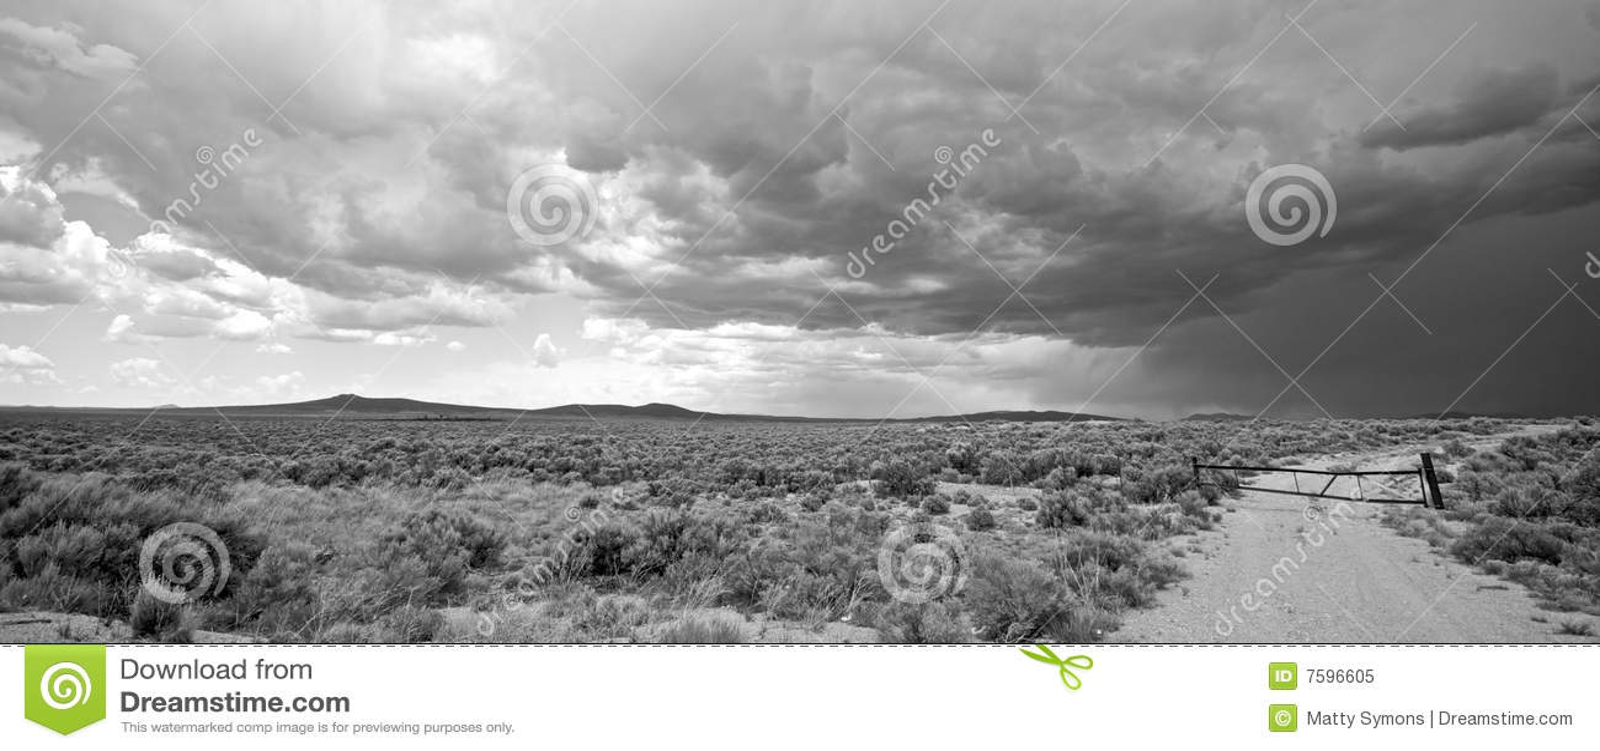 Mexiko-Sturm